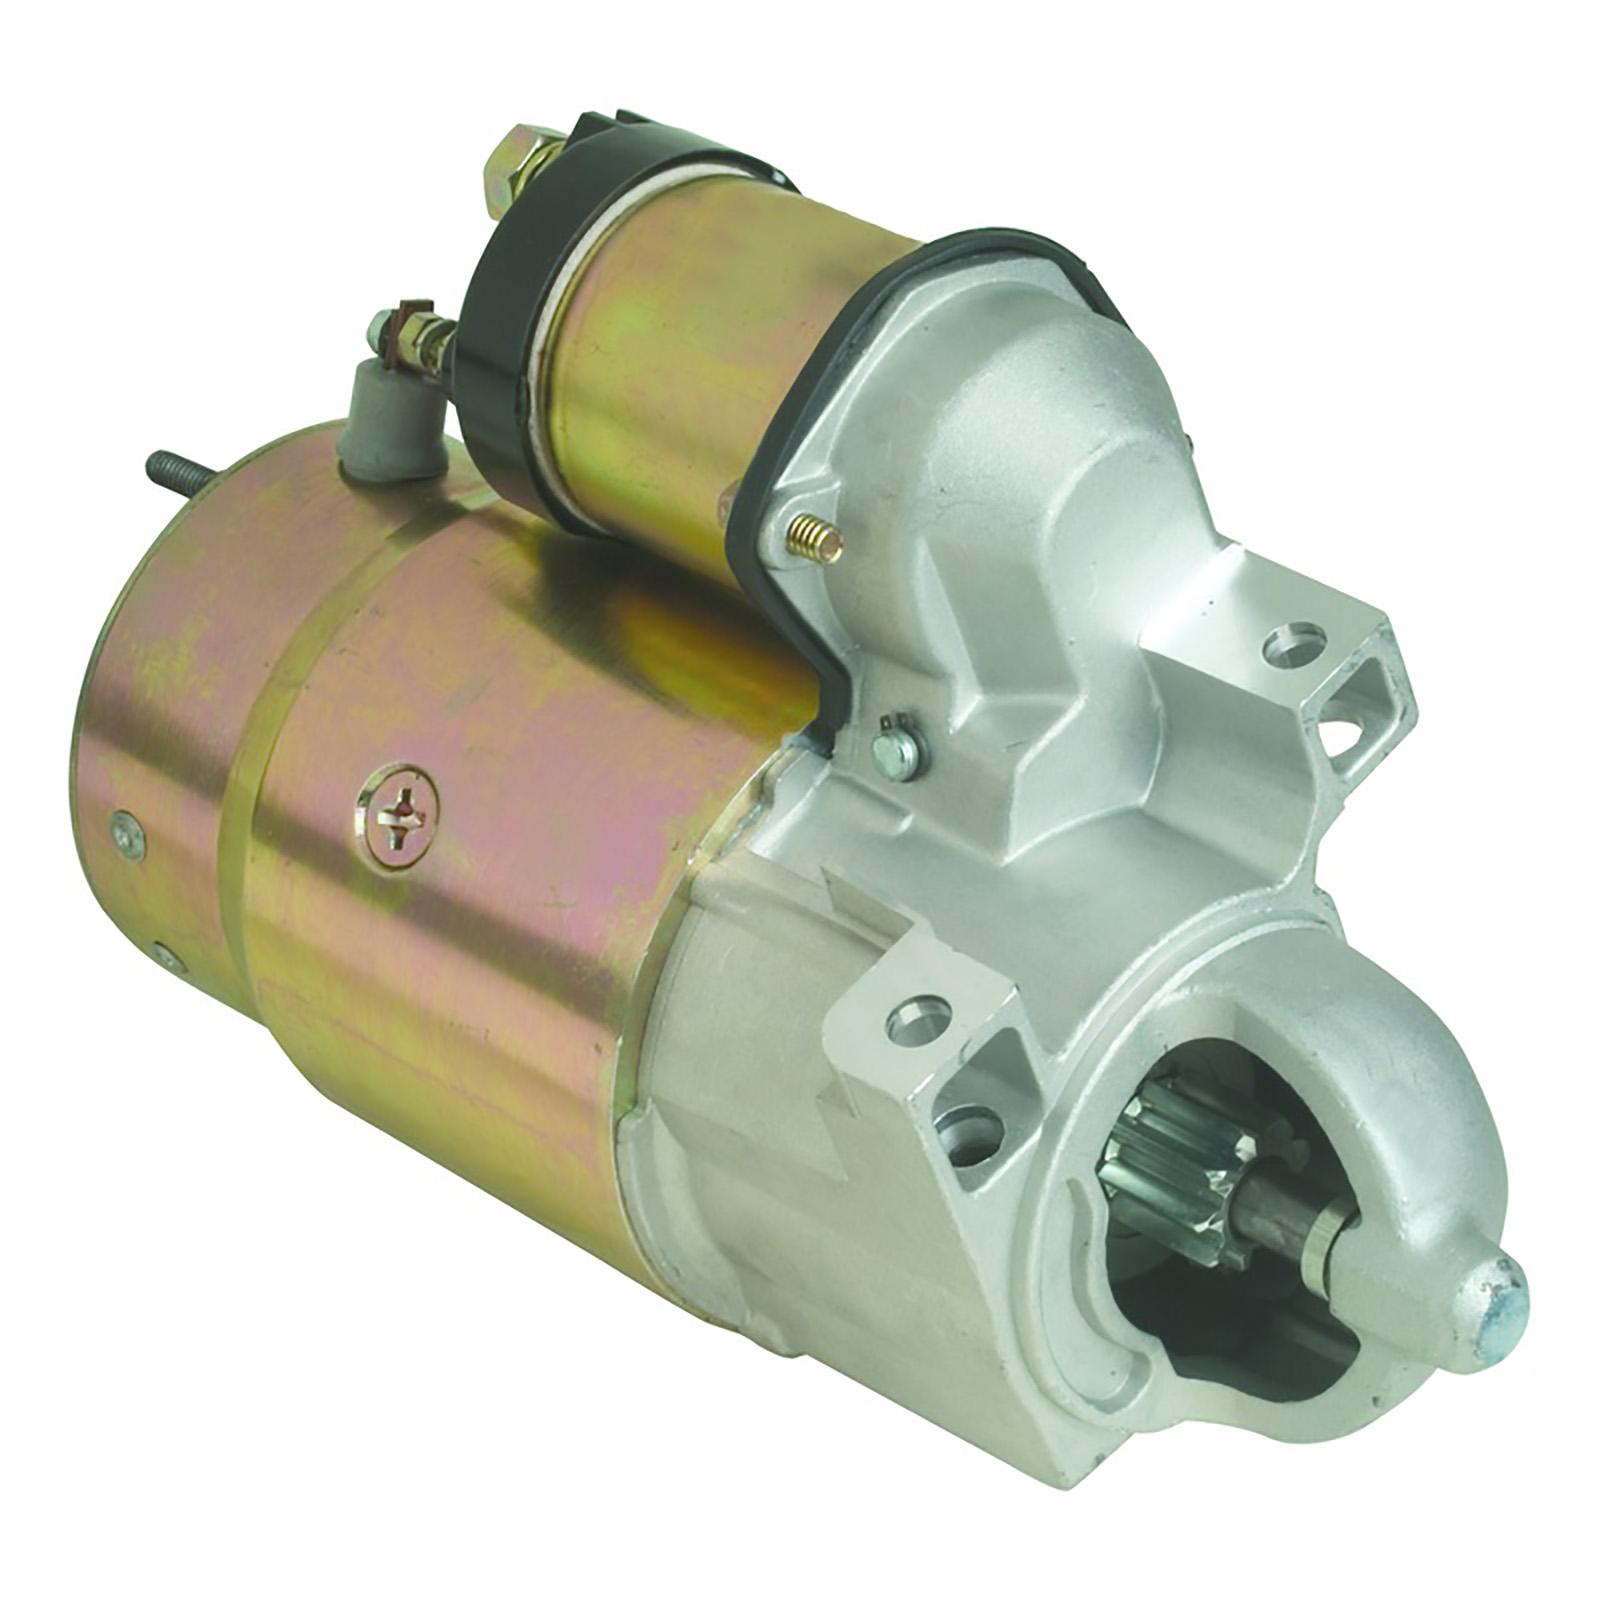 Volvo Penta Aq260 Wiring Harness Best Electrical Circuit Outdrive Trim Pump Diagrams Library Rh 51 Codingcommunity De Gage 57